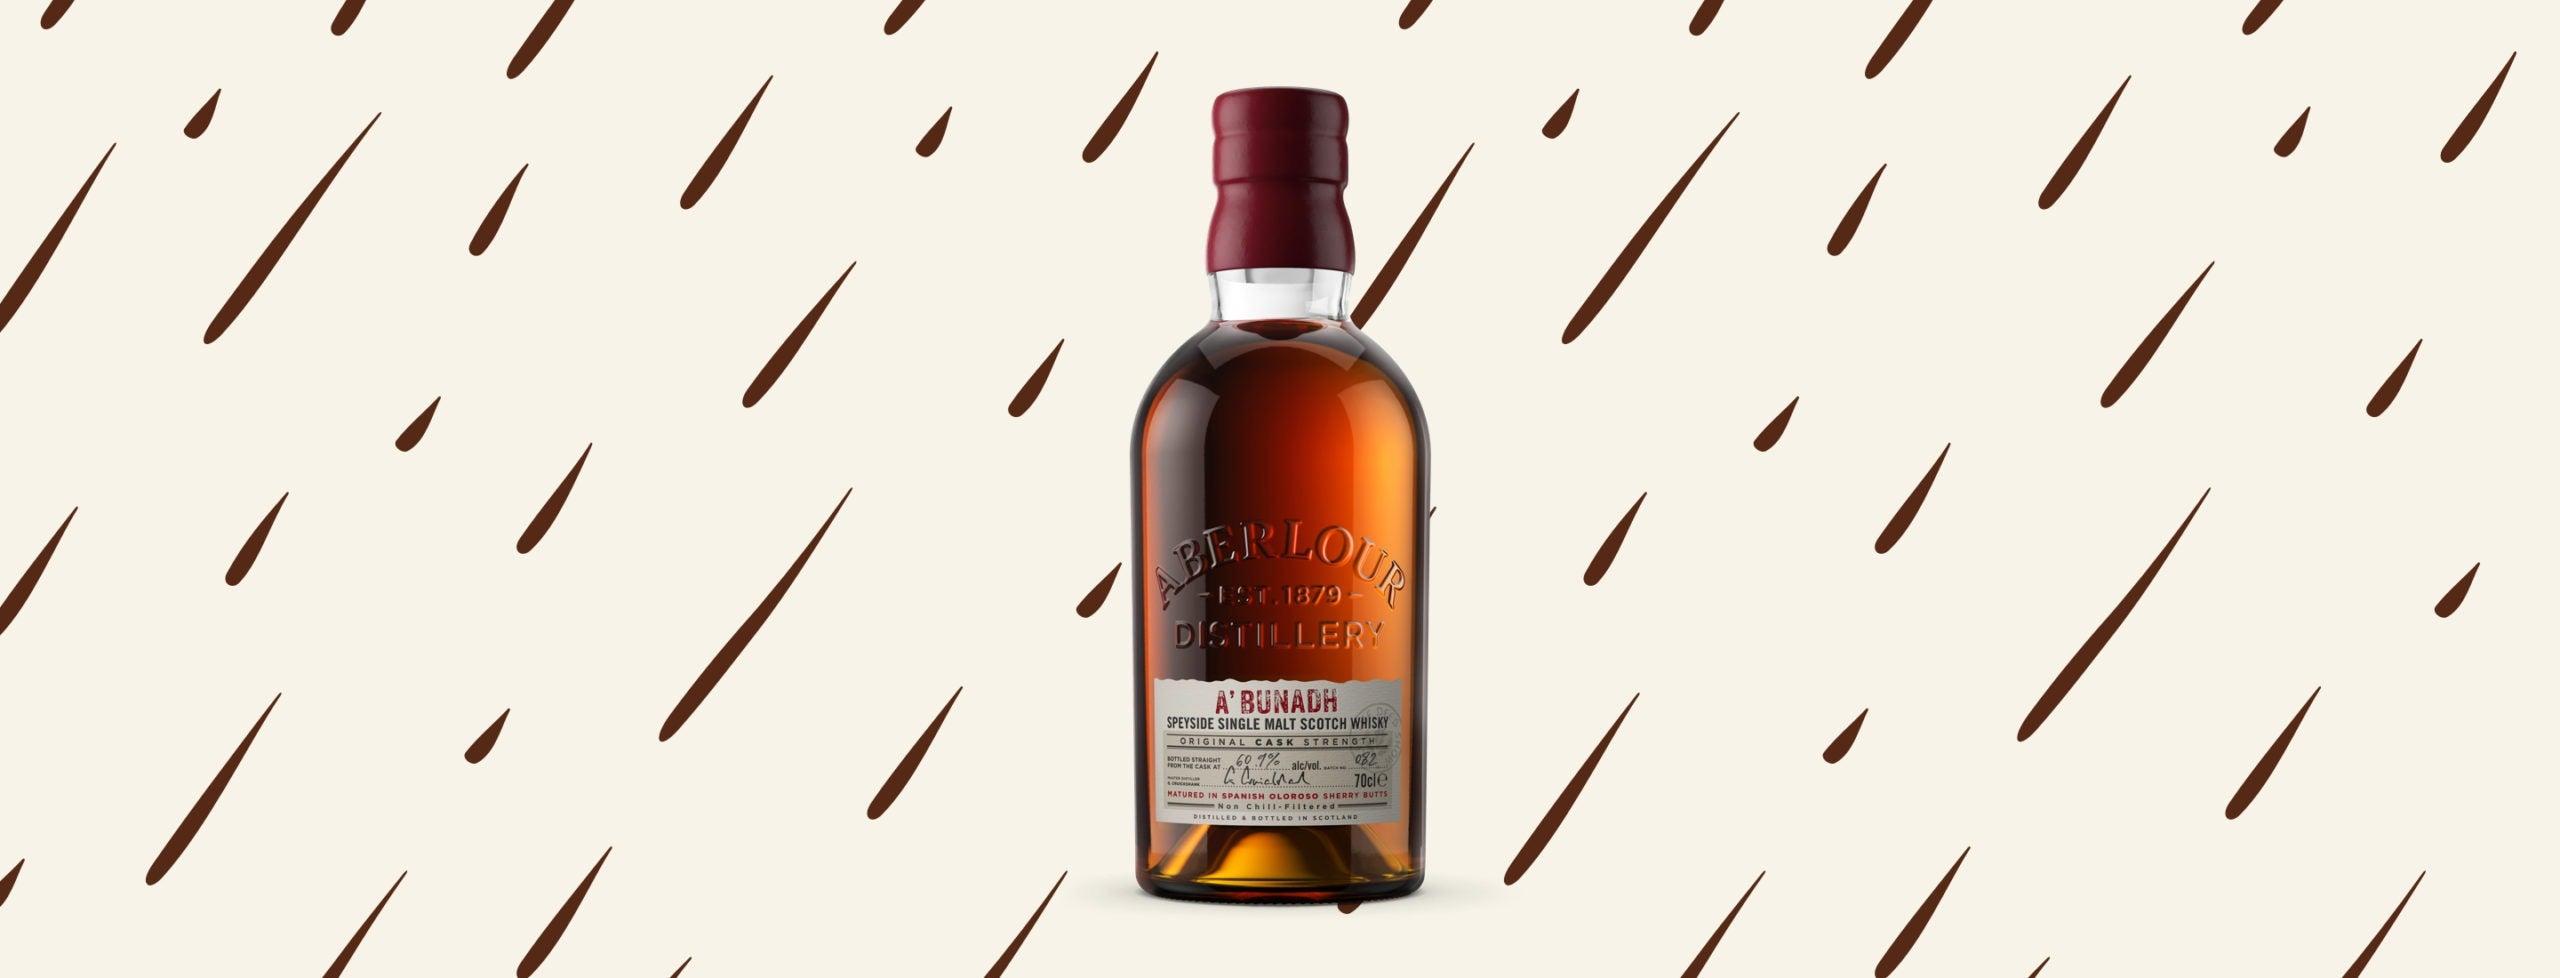 aberlour abunadh speyside single malt scotch whisky